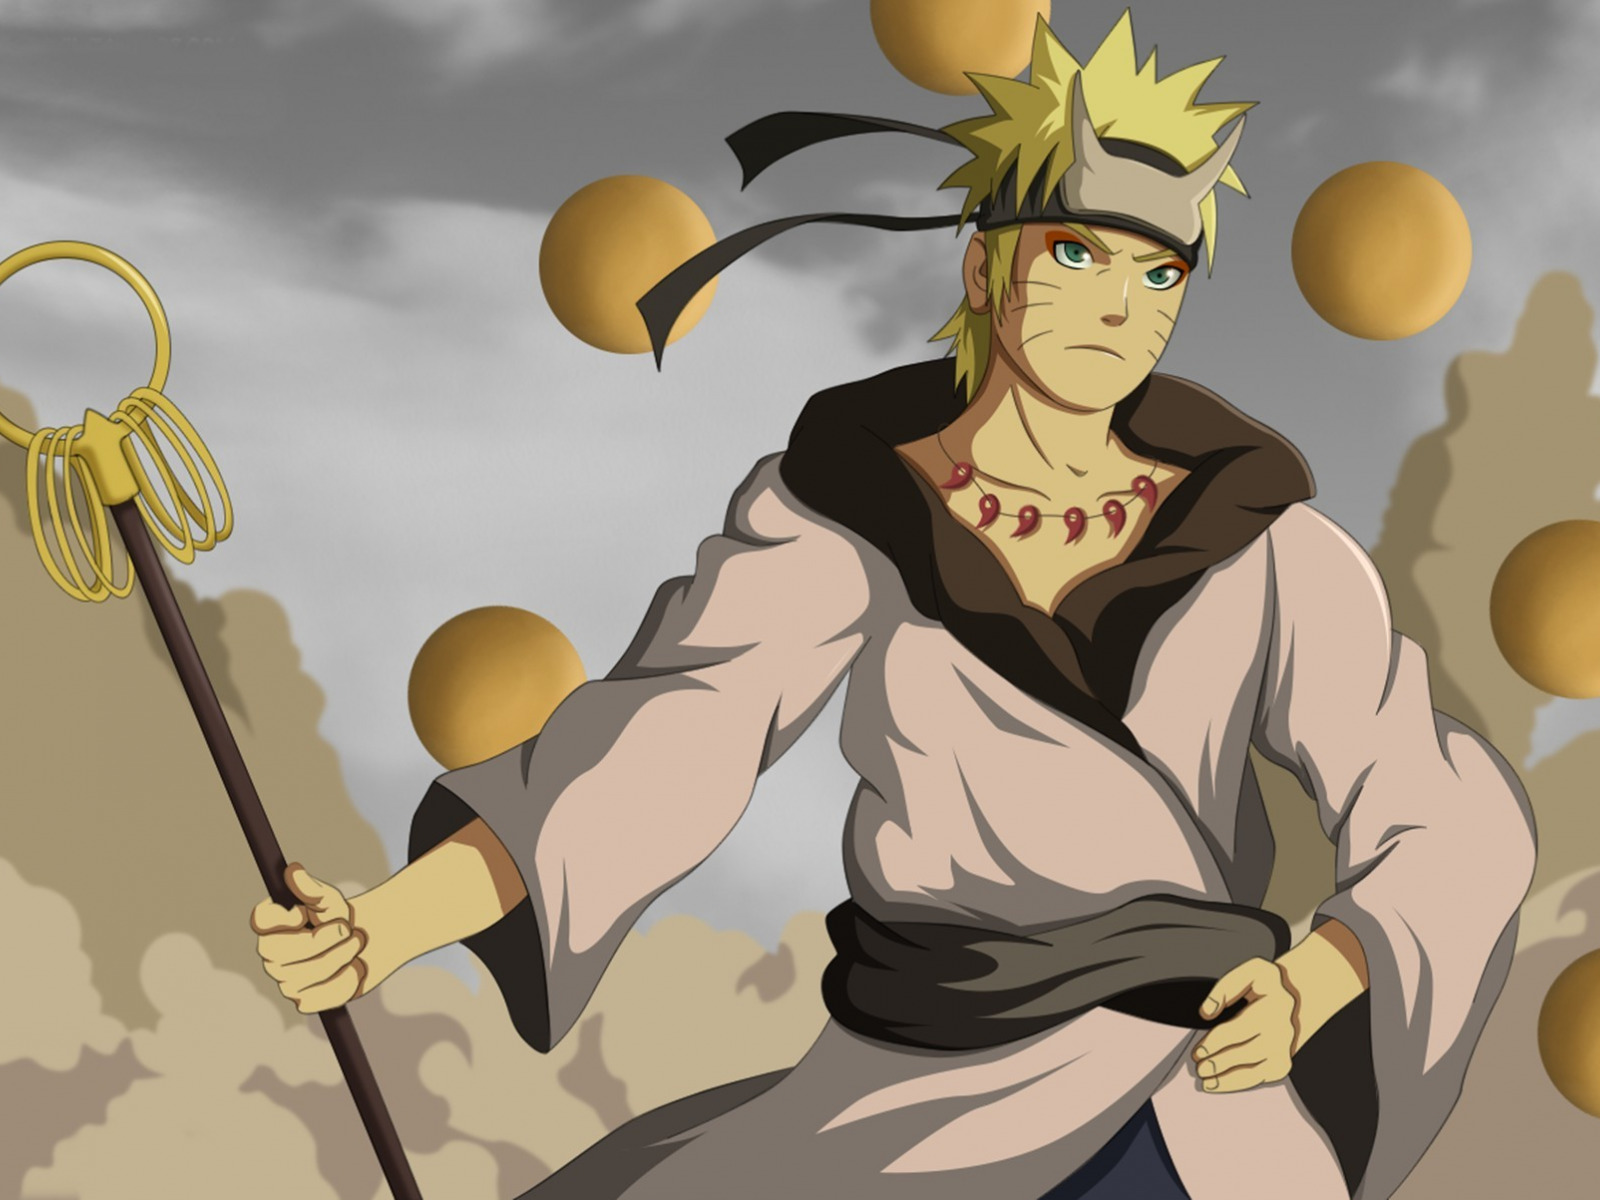 Download Wallpaper Naruto War Anime Boy Ninja Asian Manga